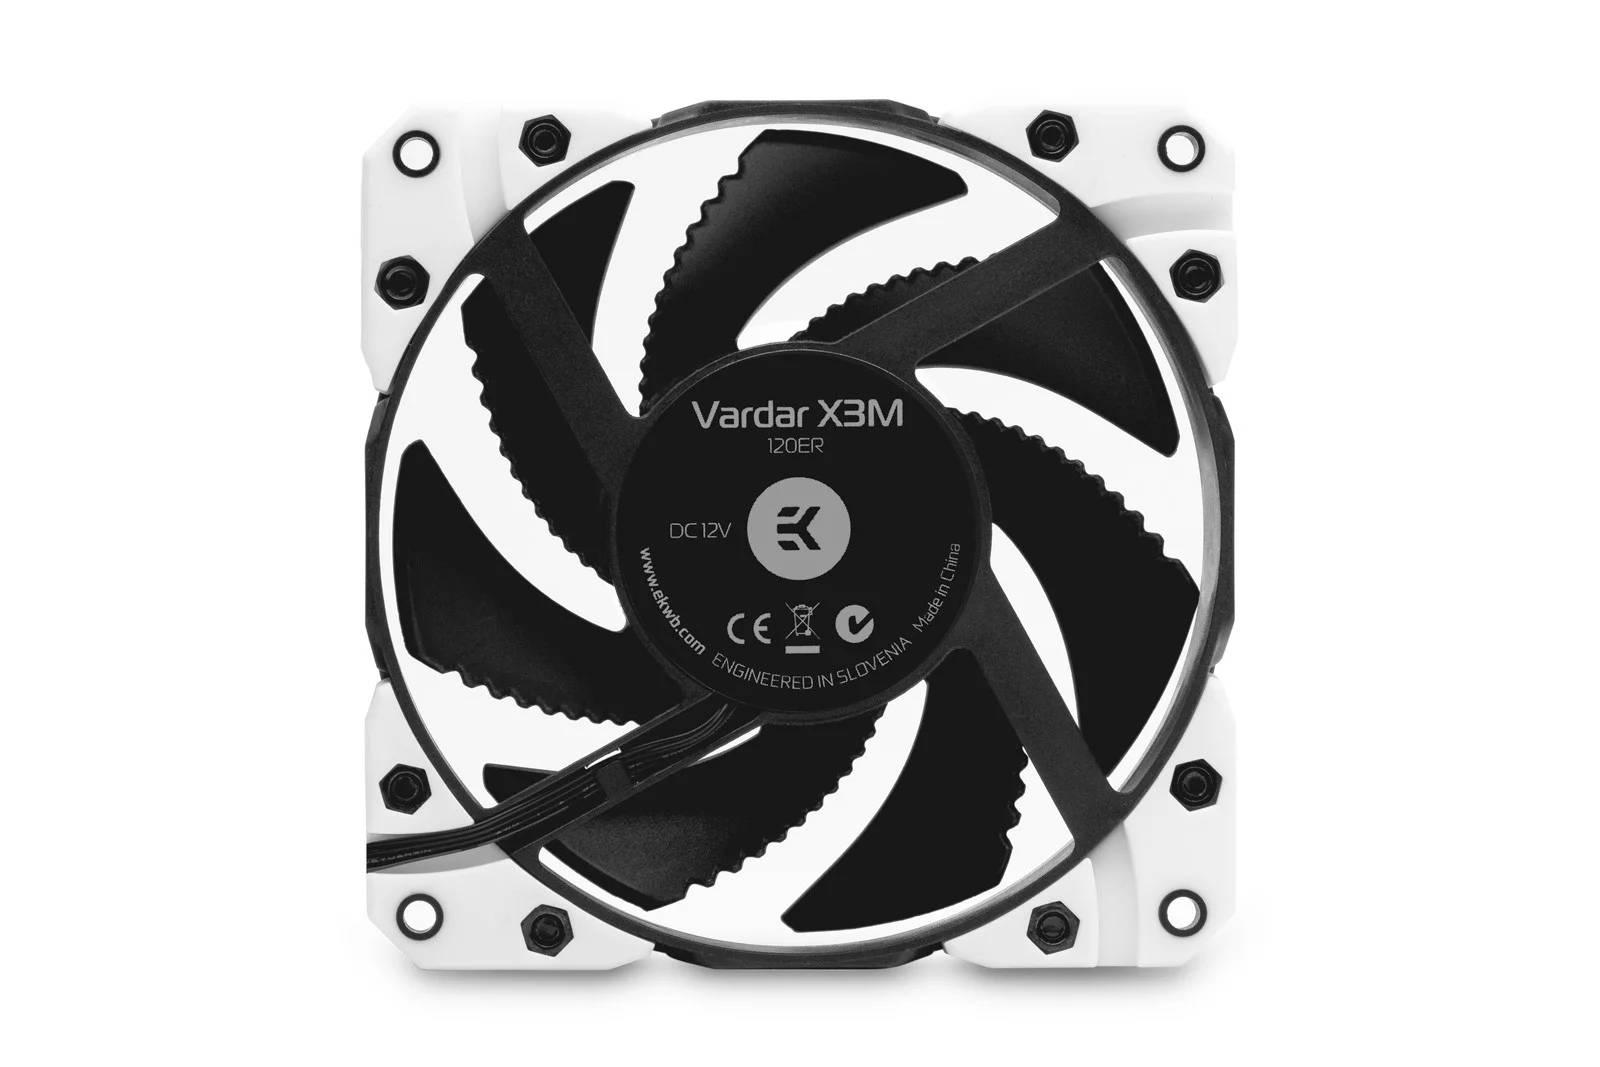 EK WaterBlocks EK-Vardar X3M 120ER (500-2200 rpm) - White